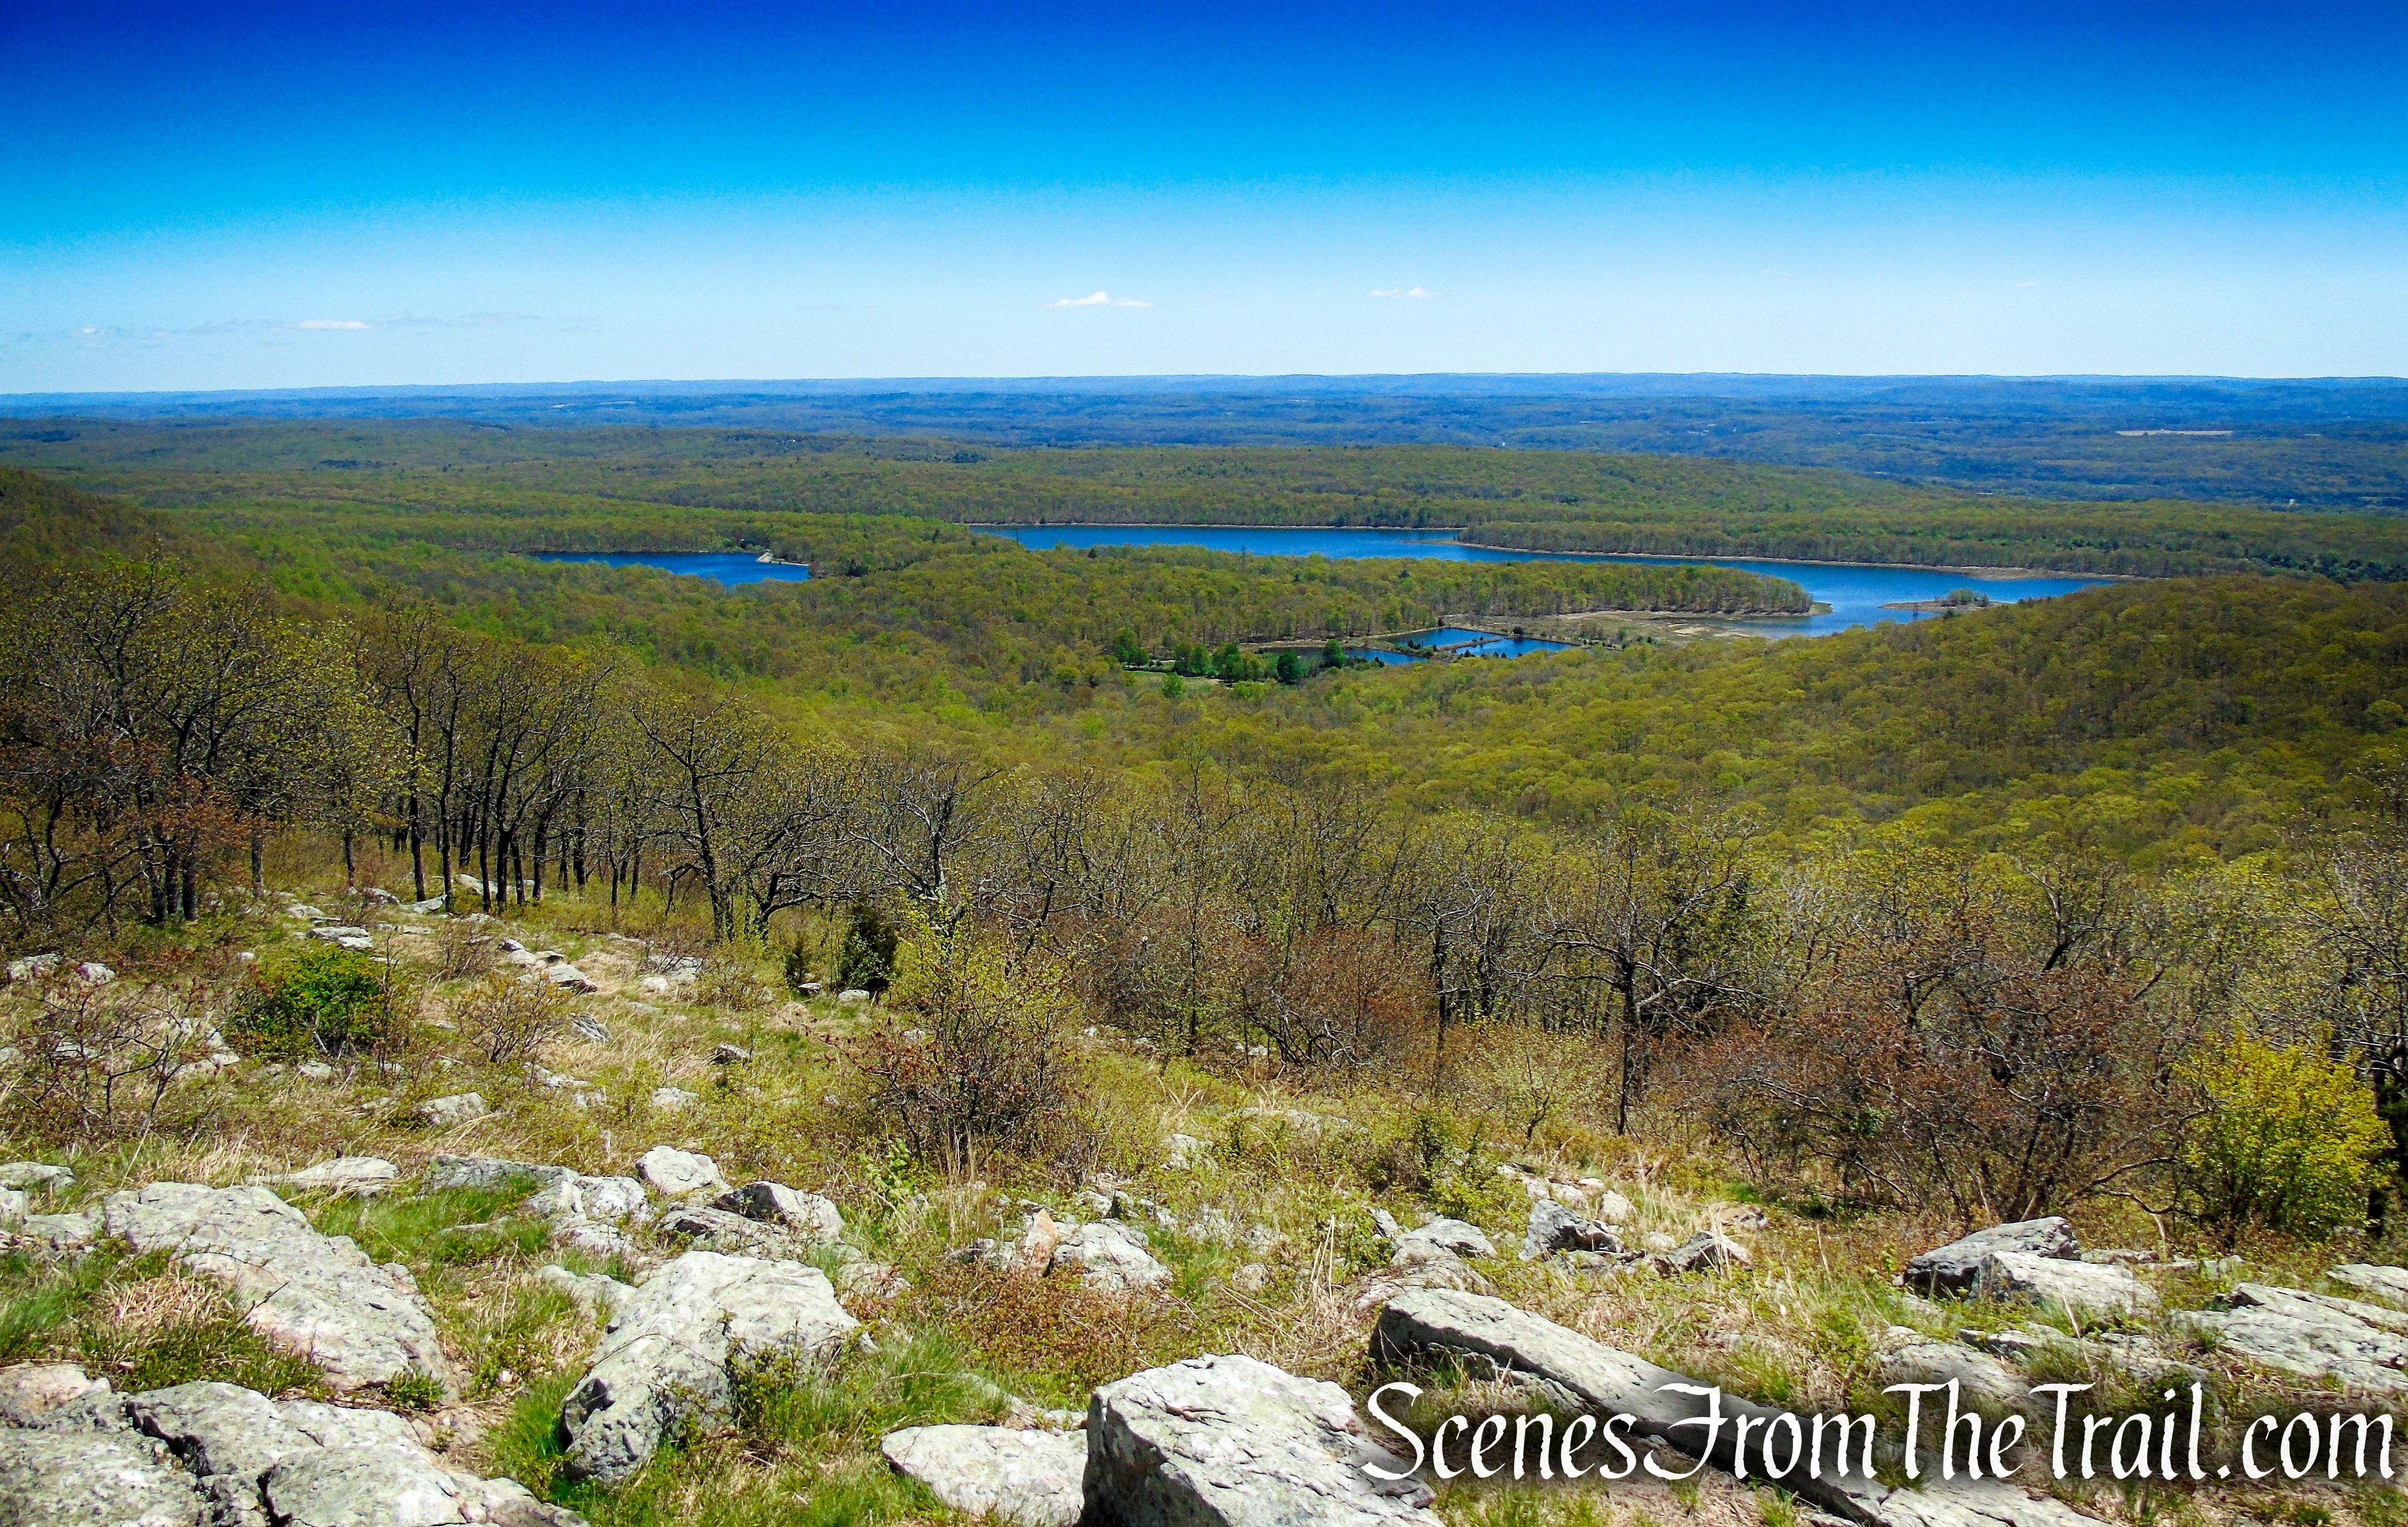 Lower Yards Creek Reservoir from Raccoon Ridge